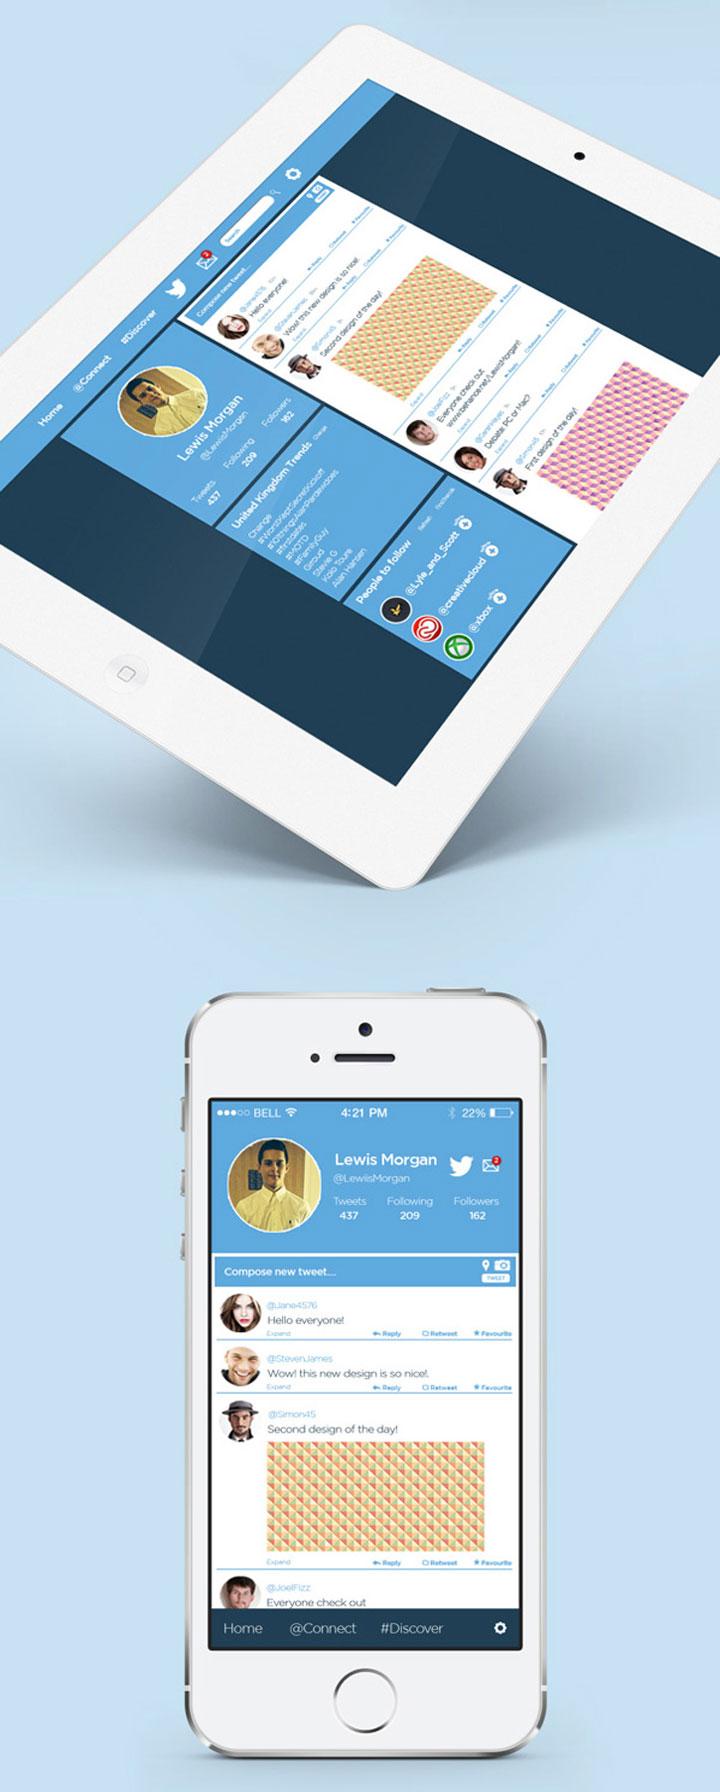 Twitter tasarım konsepti - Lewis Morgan